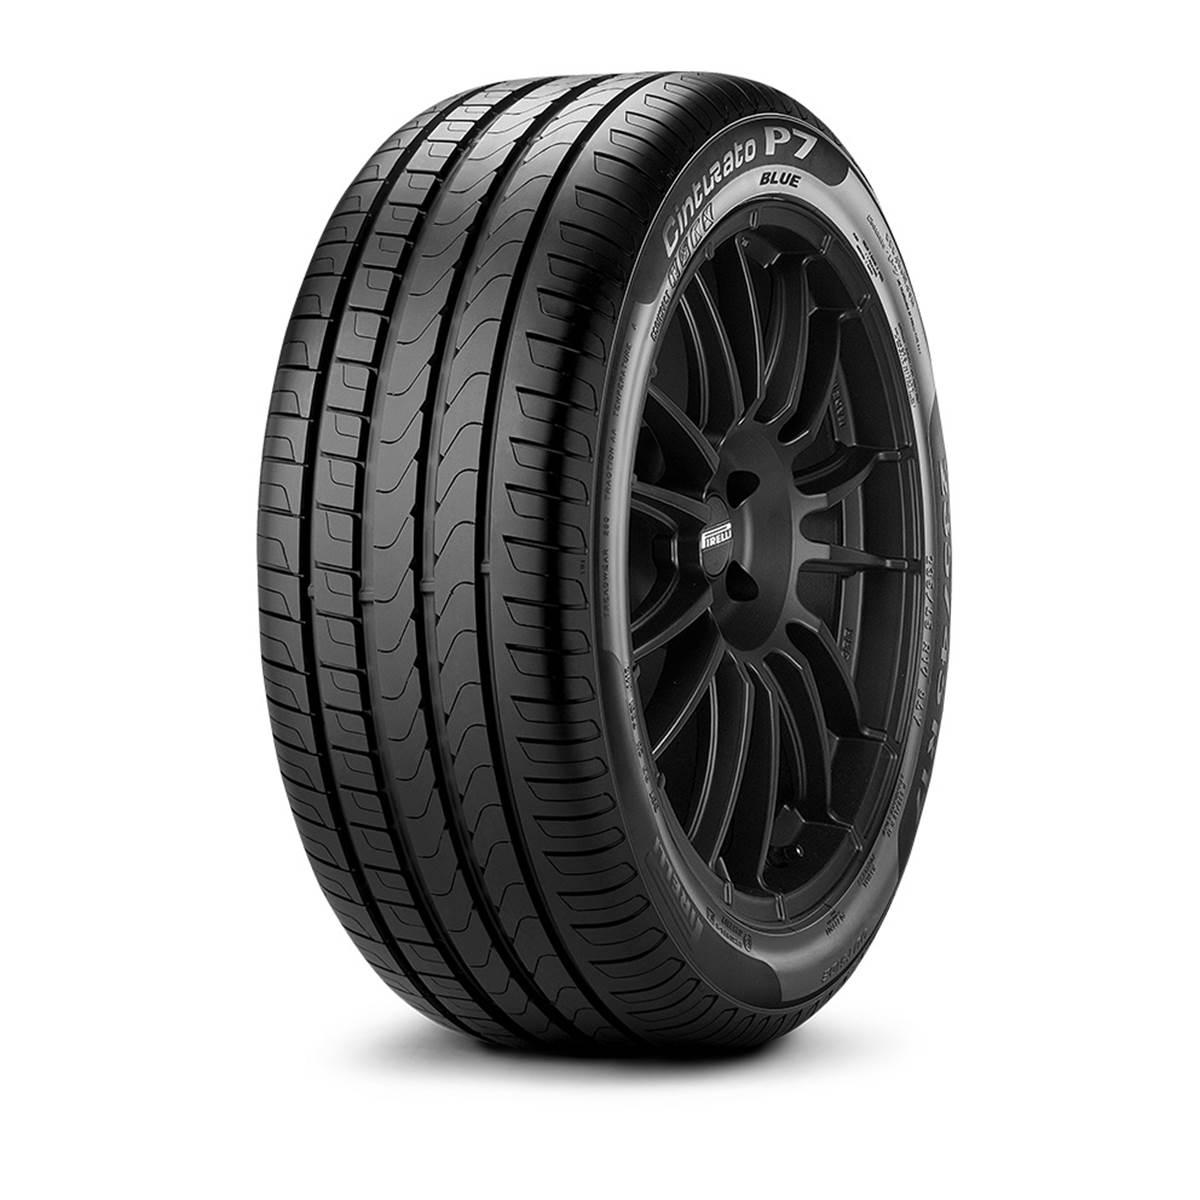 Pneu Pirelli 205/50R17 93W Cinturato P7 Blue XL